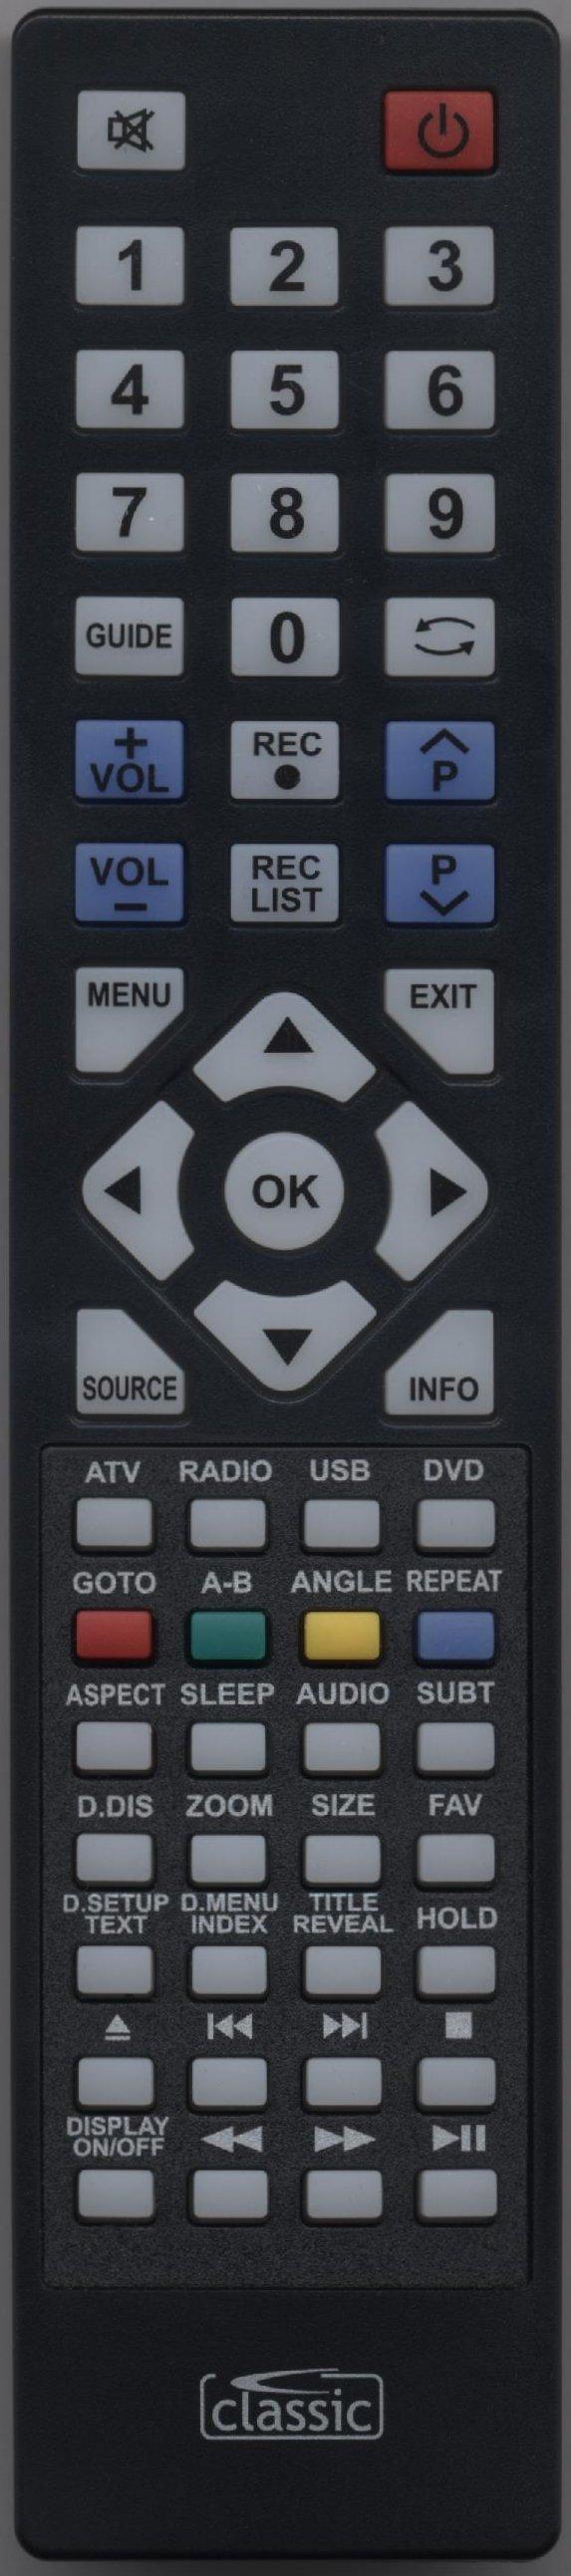 Blaupunkt 23/50E-BR-2B-TCDUP-UK Remote Control